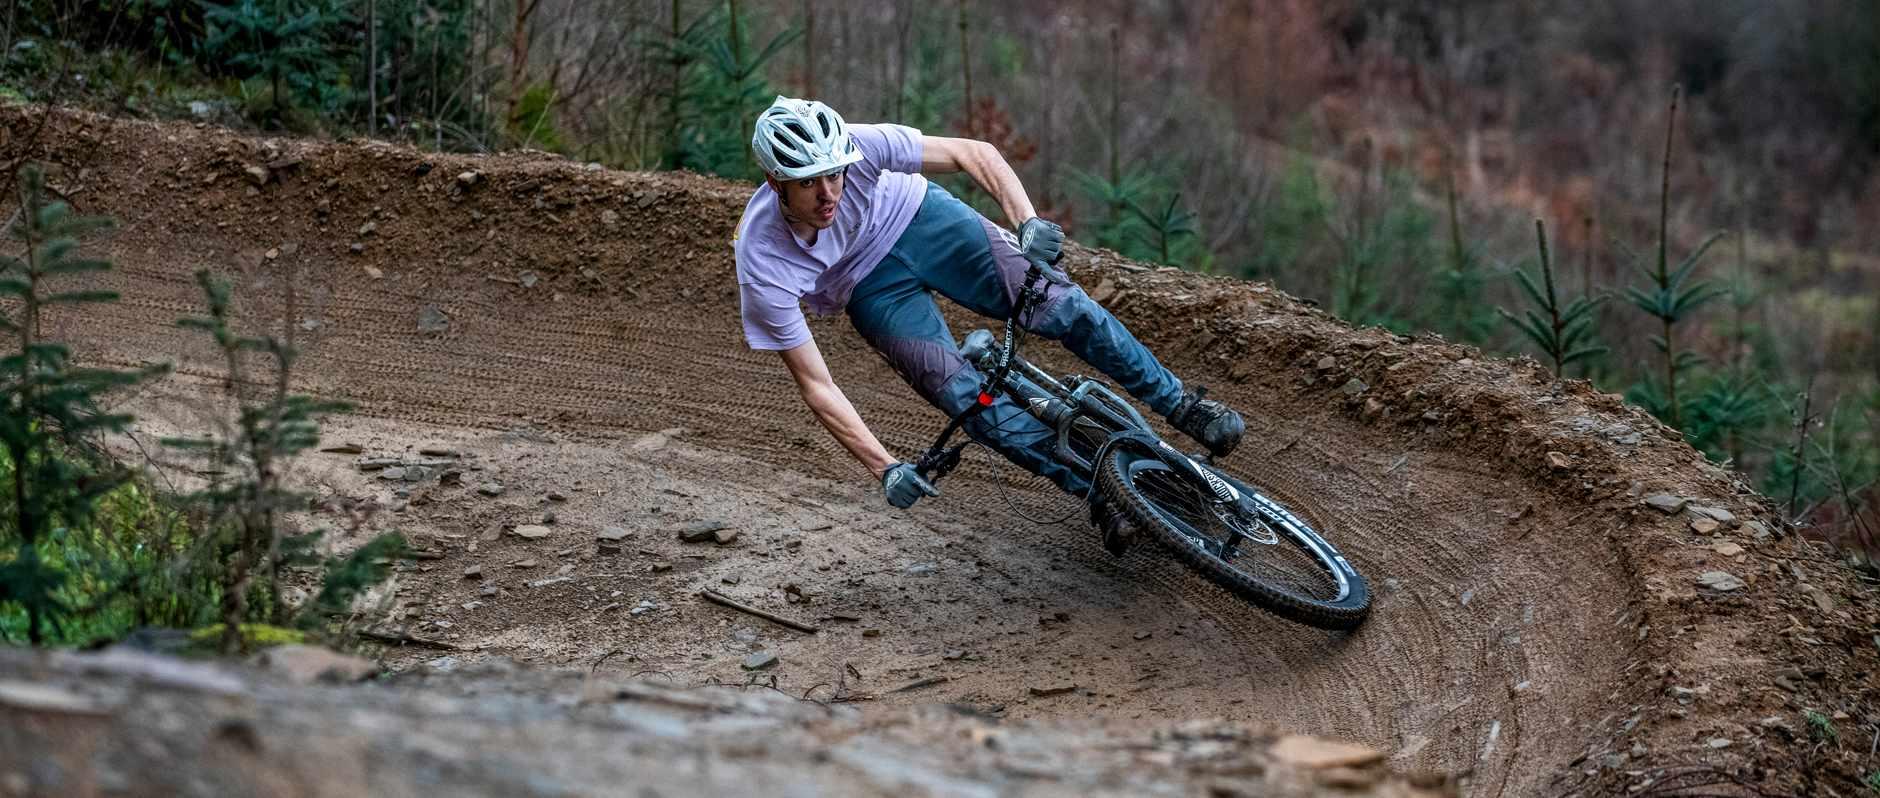 Leo Sandler at BikePark Wales. Photo: Andy Lloyd